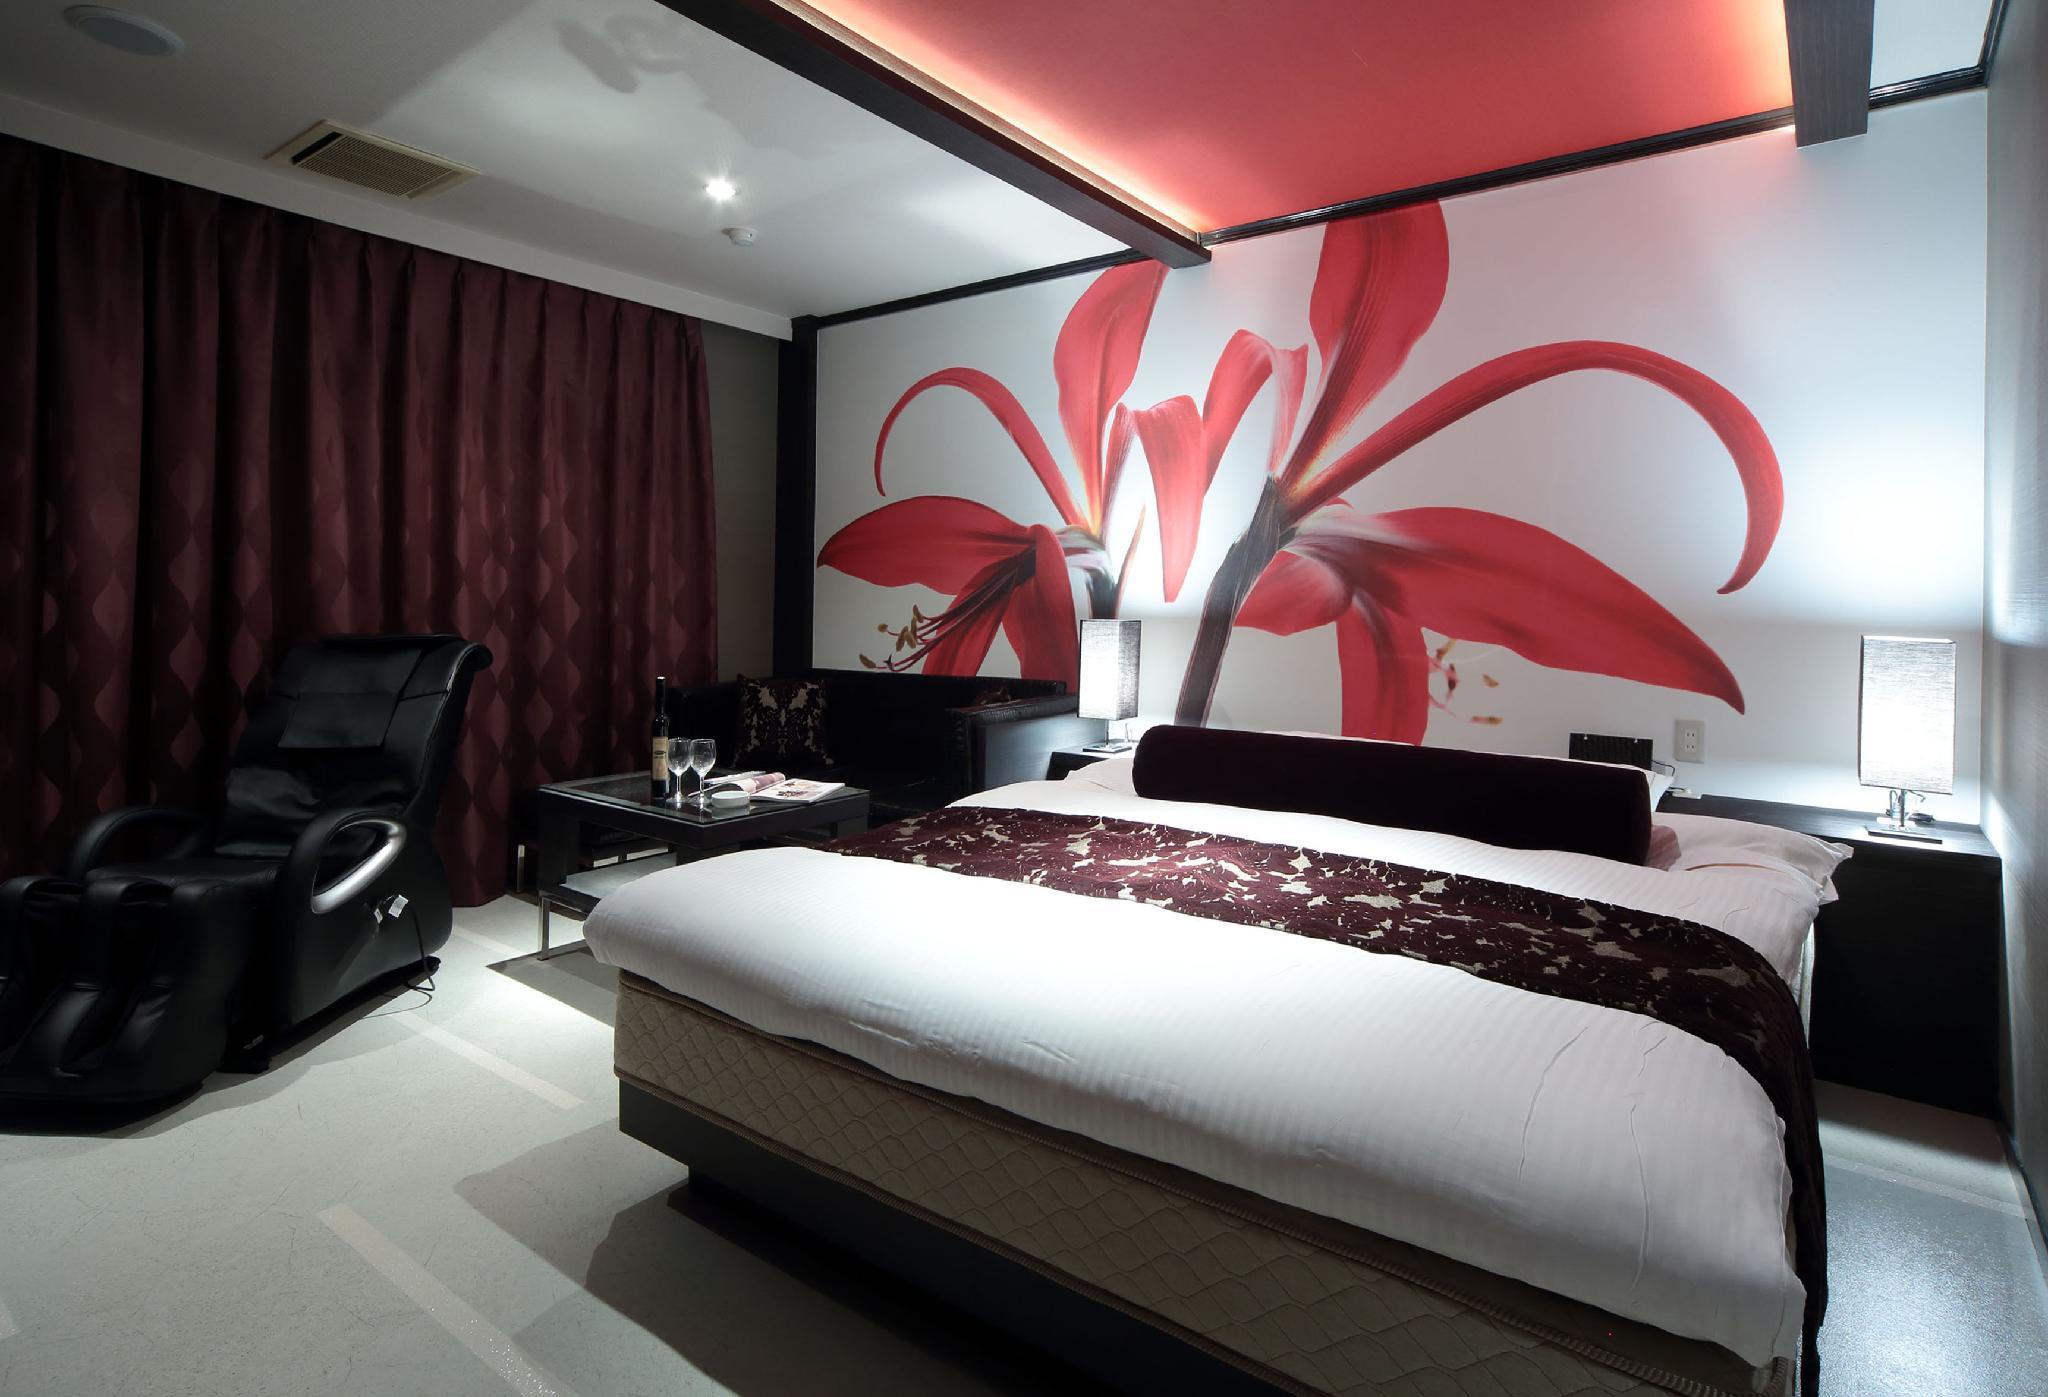 Hotel Venus - Adult Only, Kanie